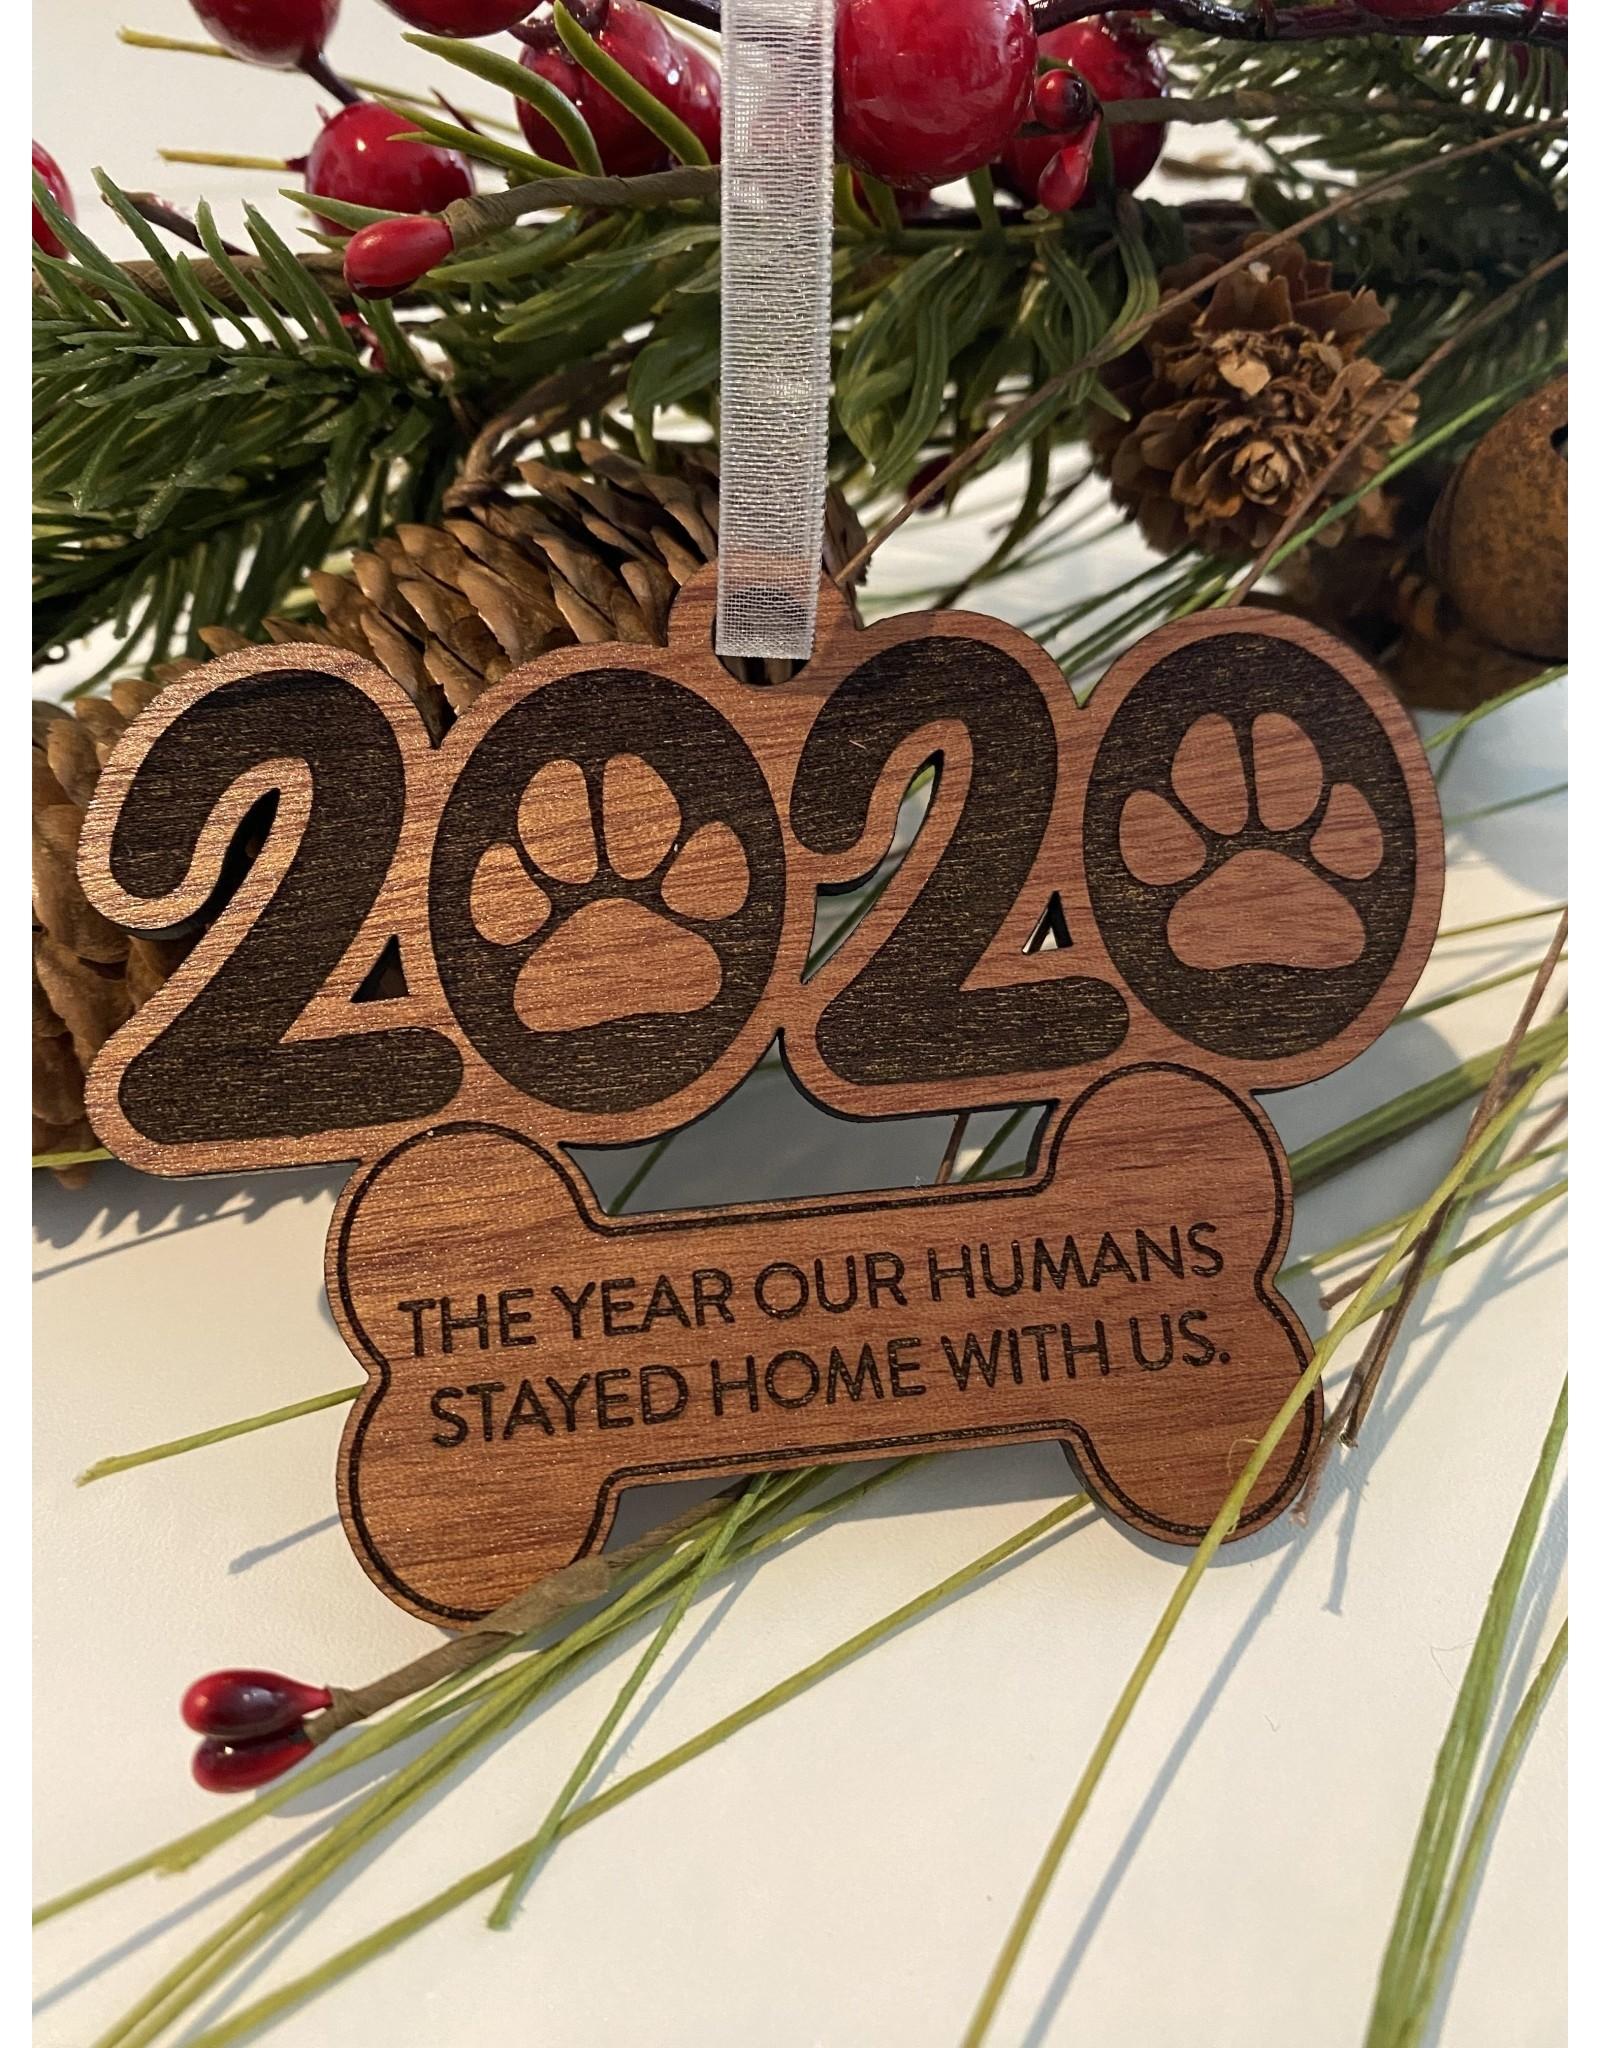 The Good Tree 2020 Dog Ornament